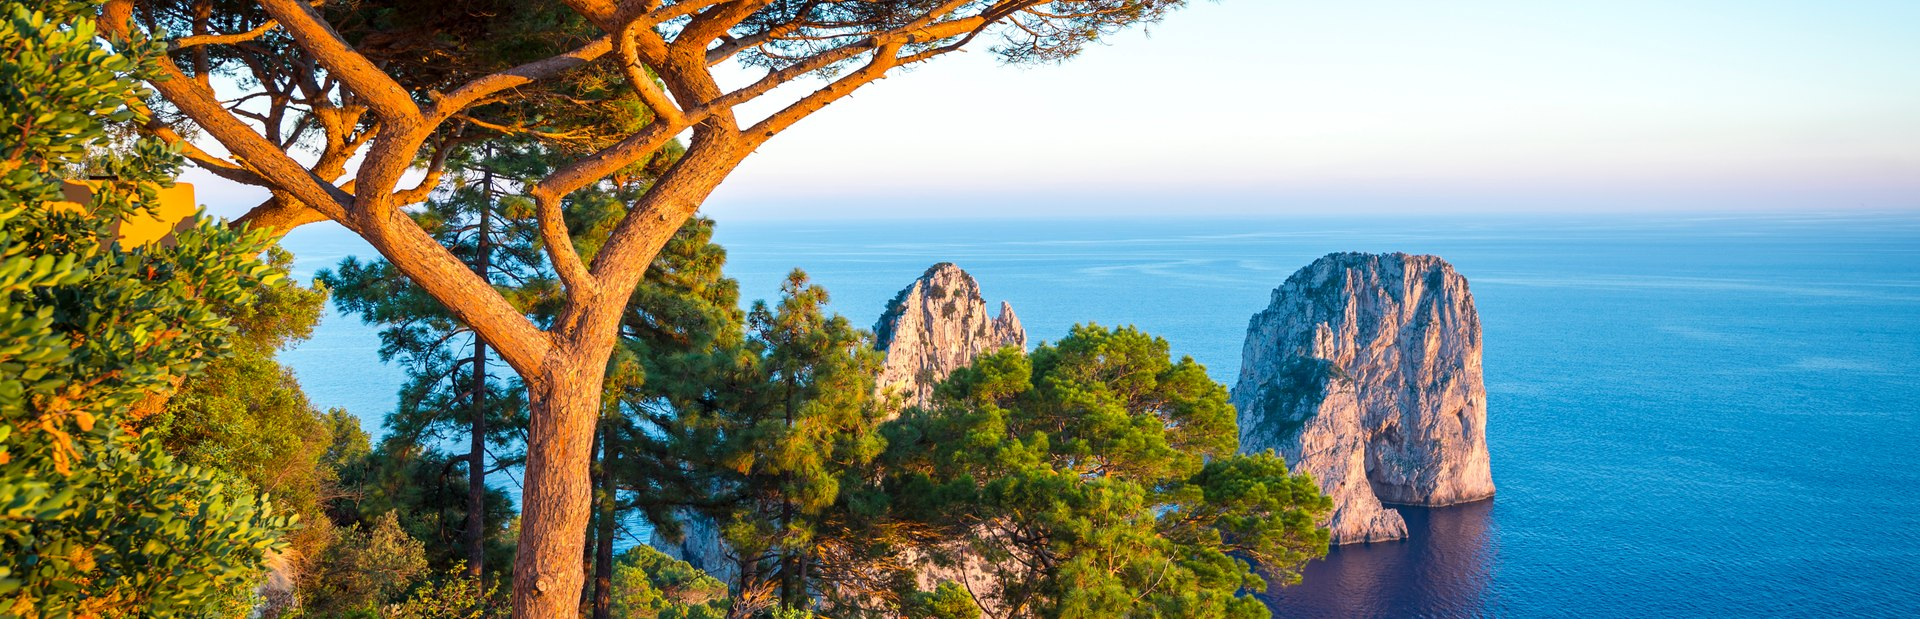 Capri climate photo